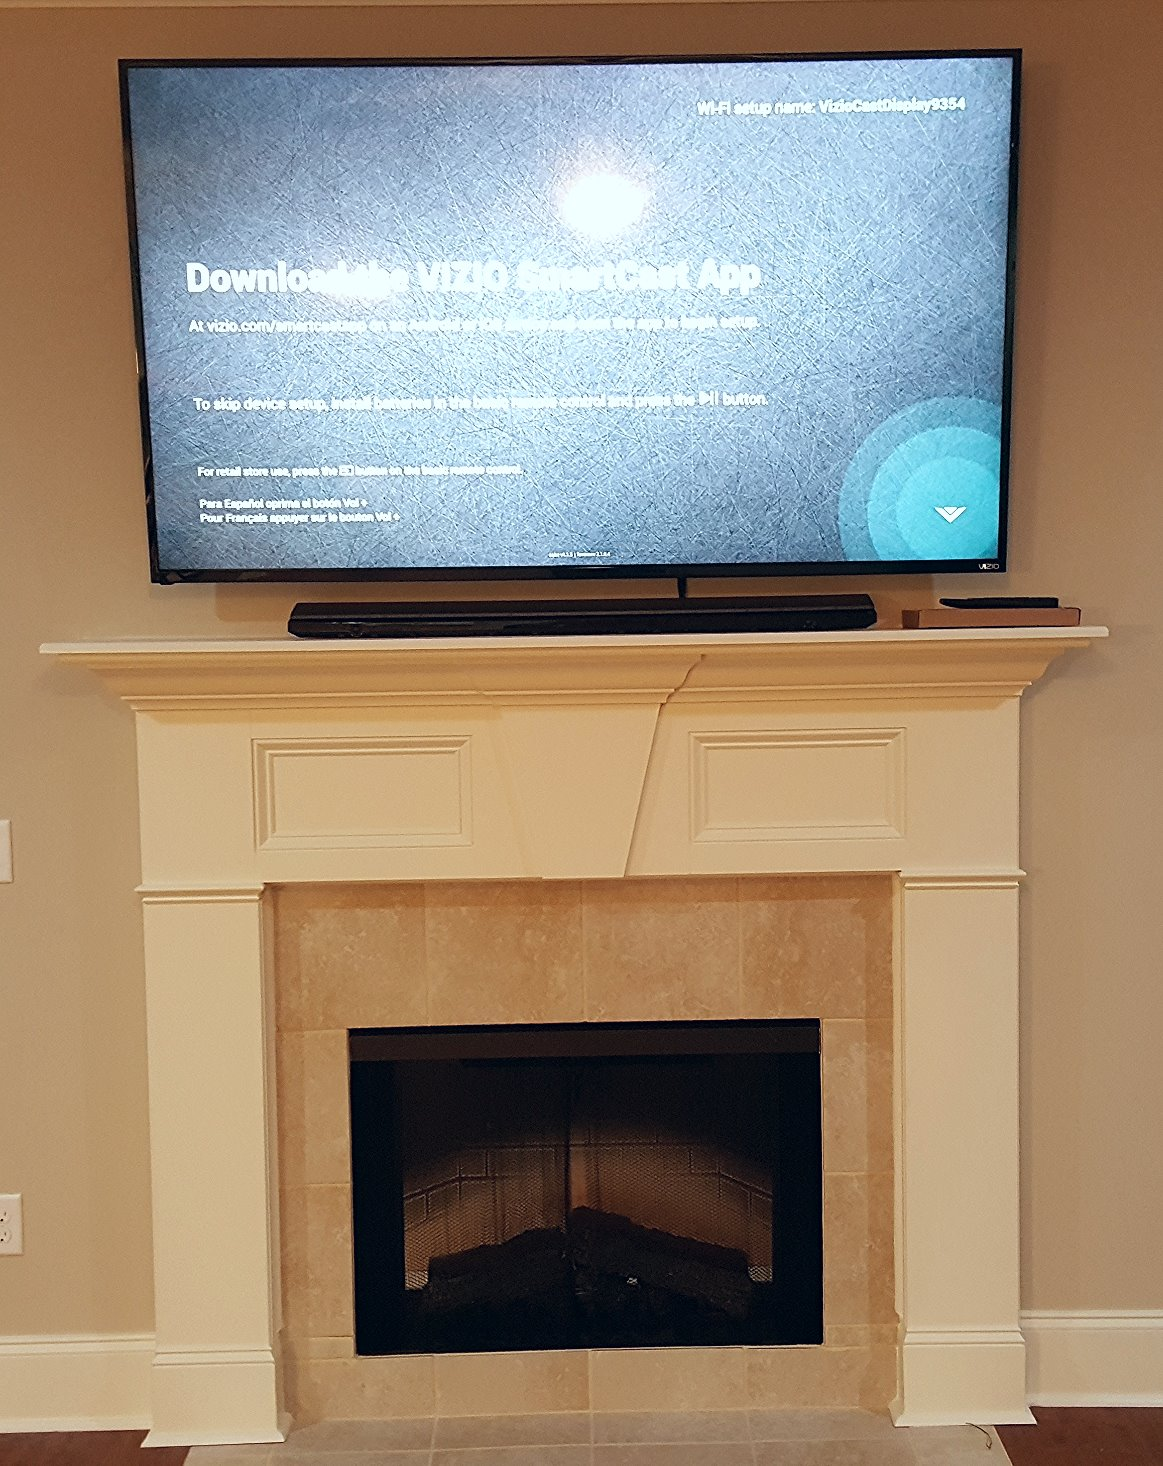 70in HDTV and soundbar_edited